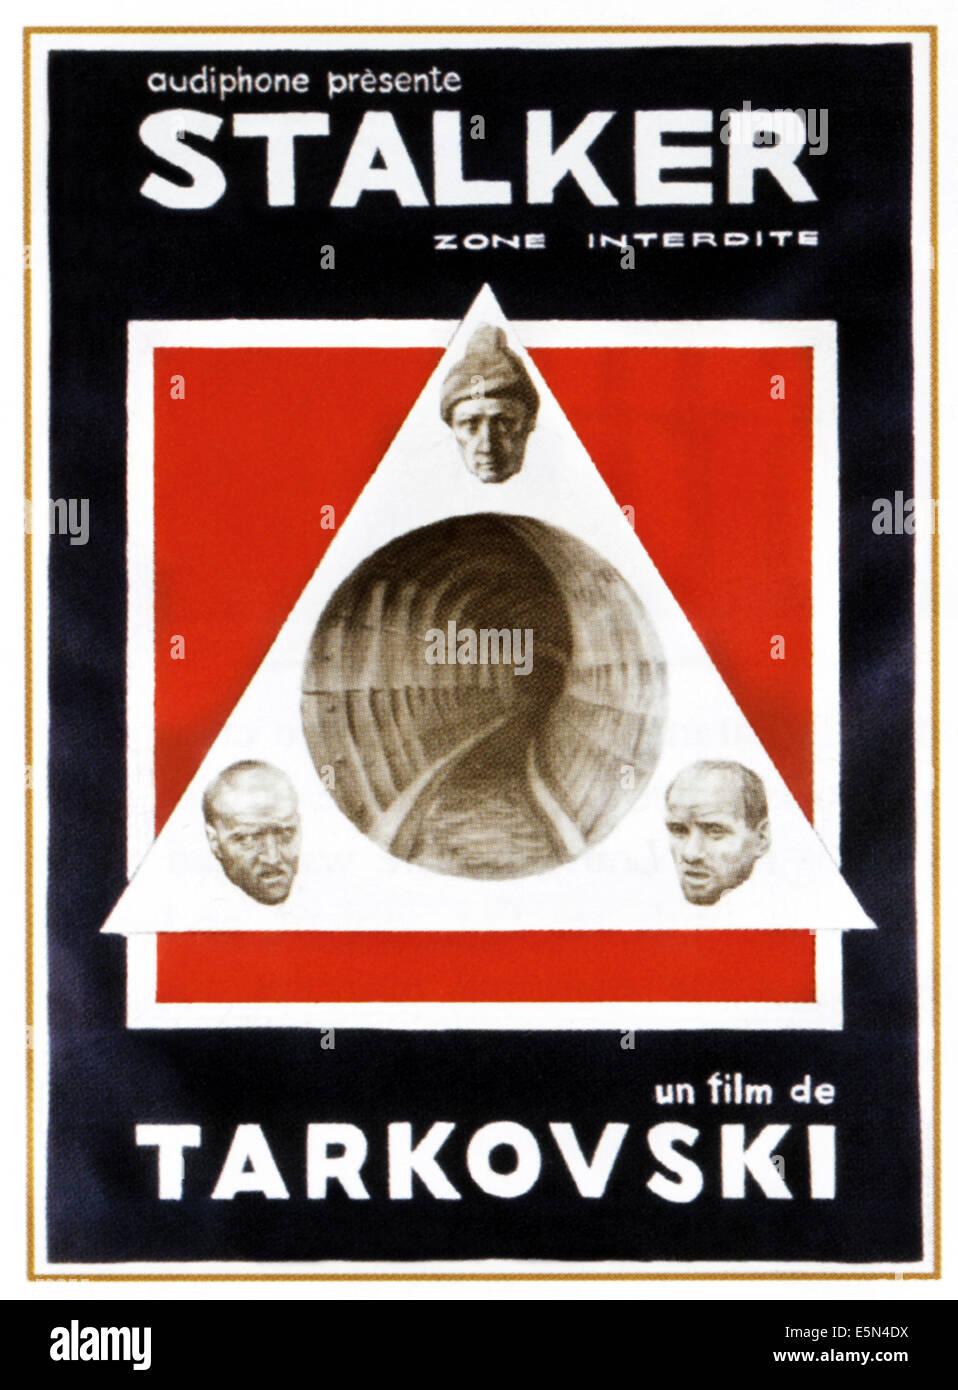 STALKER, 1980 Fédération de poster, 1979. Photo Stock